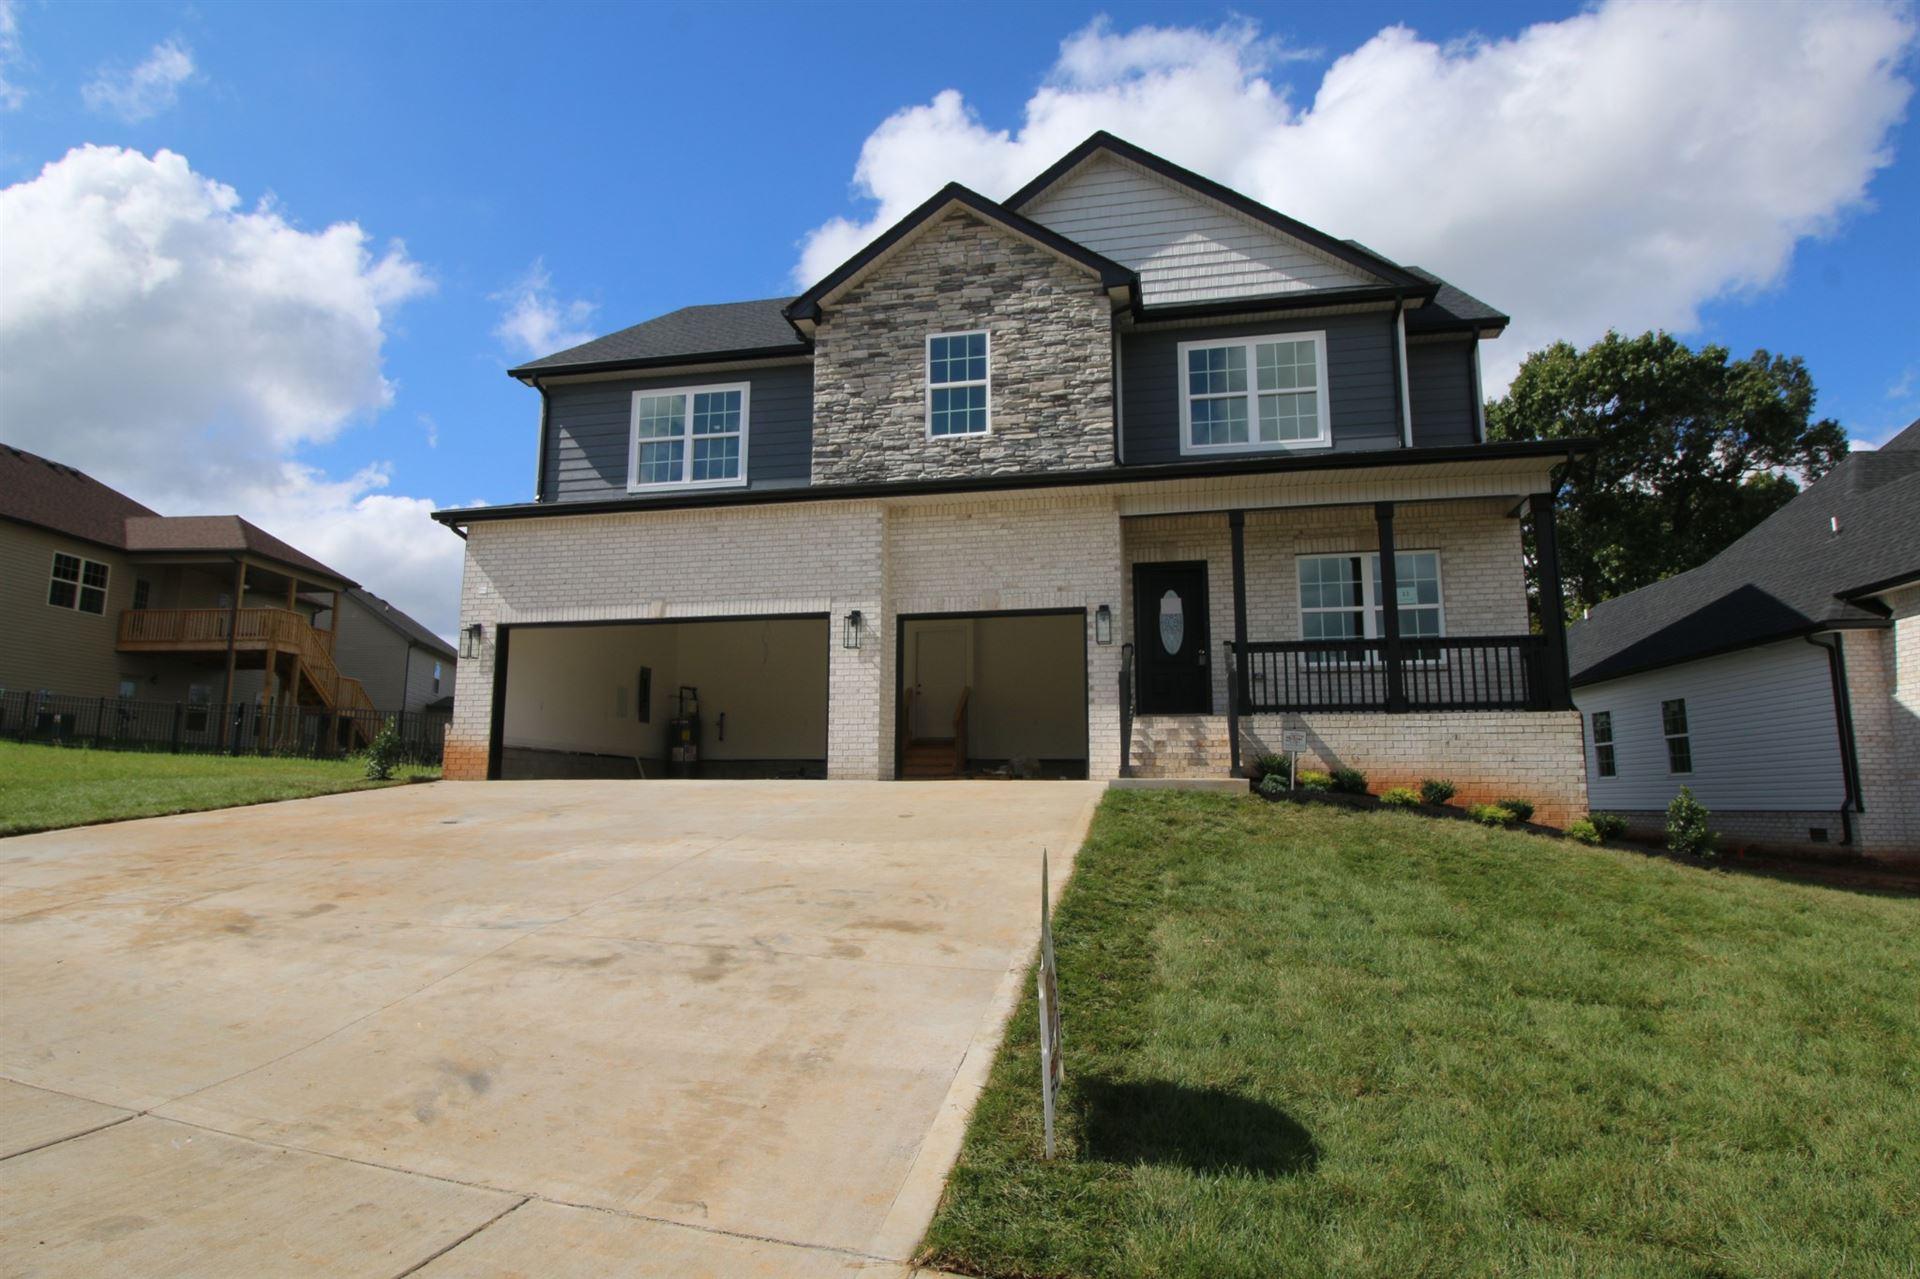 11 Charleston Oaks Reserves, Clarksville, TN 37042 - MLS#: 2240723